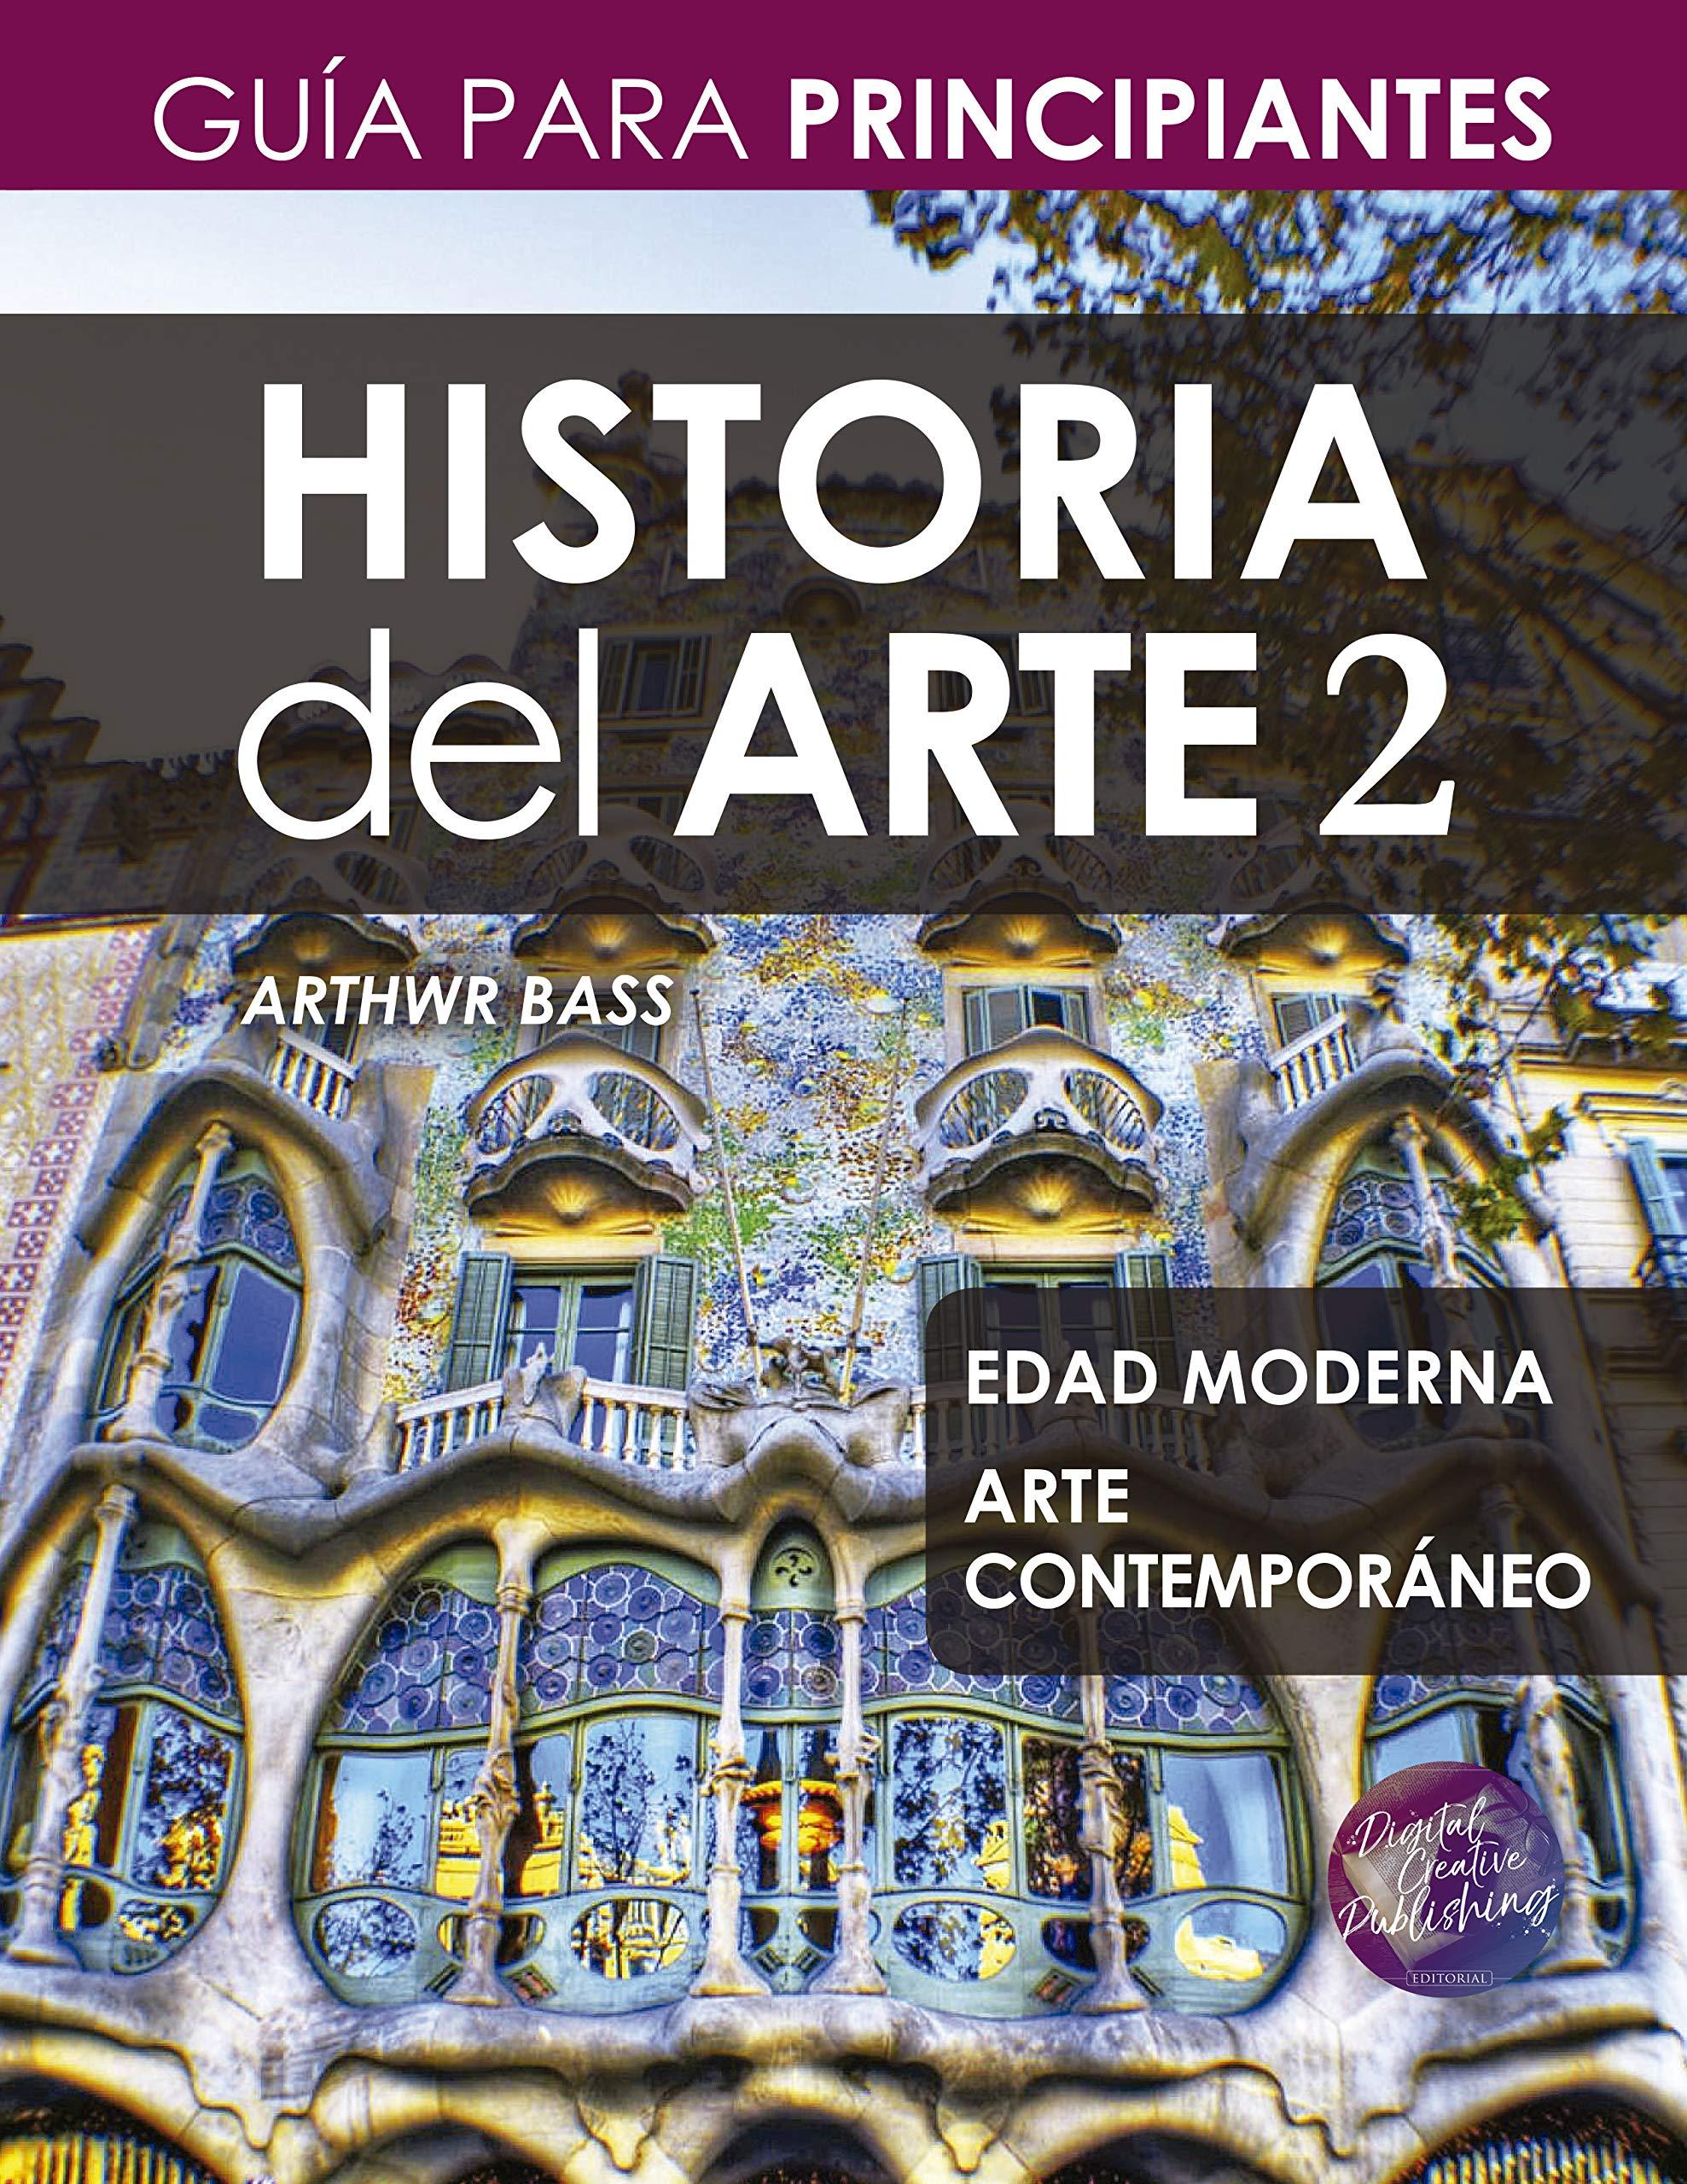 Historia del Arte 2: Guía para Principiantes por Arthwr Bass